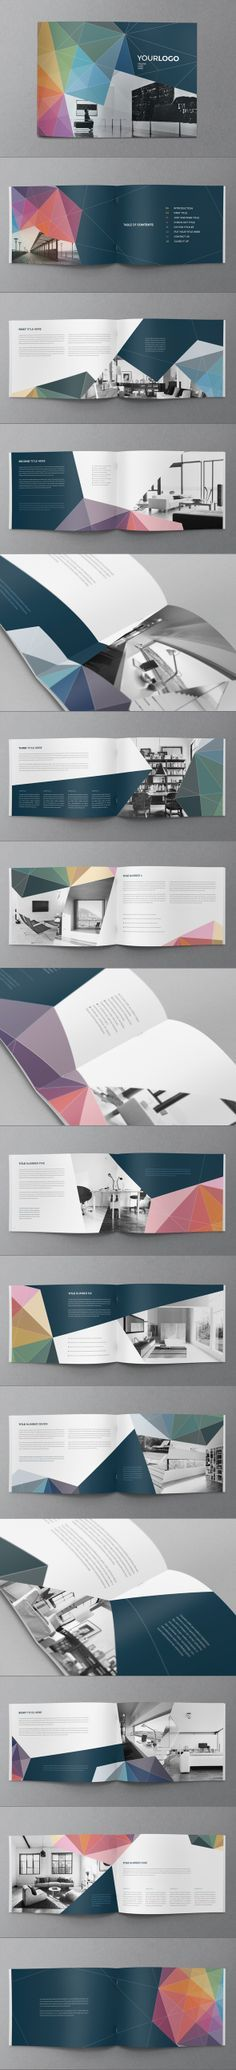 Multicolor Modern Brochure. Download here: http://graphicriver.net/item/multicolor-modern-brochure/7436397?ref=abradesign #design #brochure Latest Modern Web Designs. http://webworksagency.com